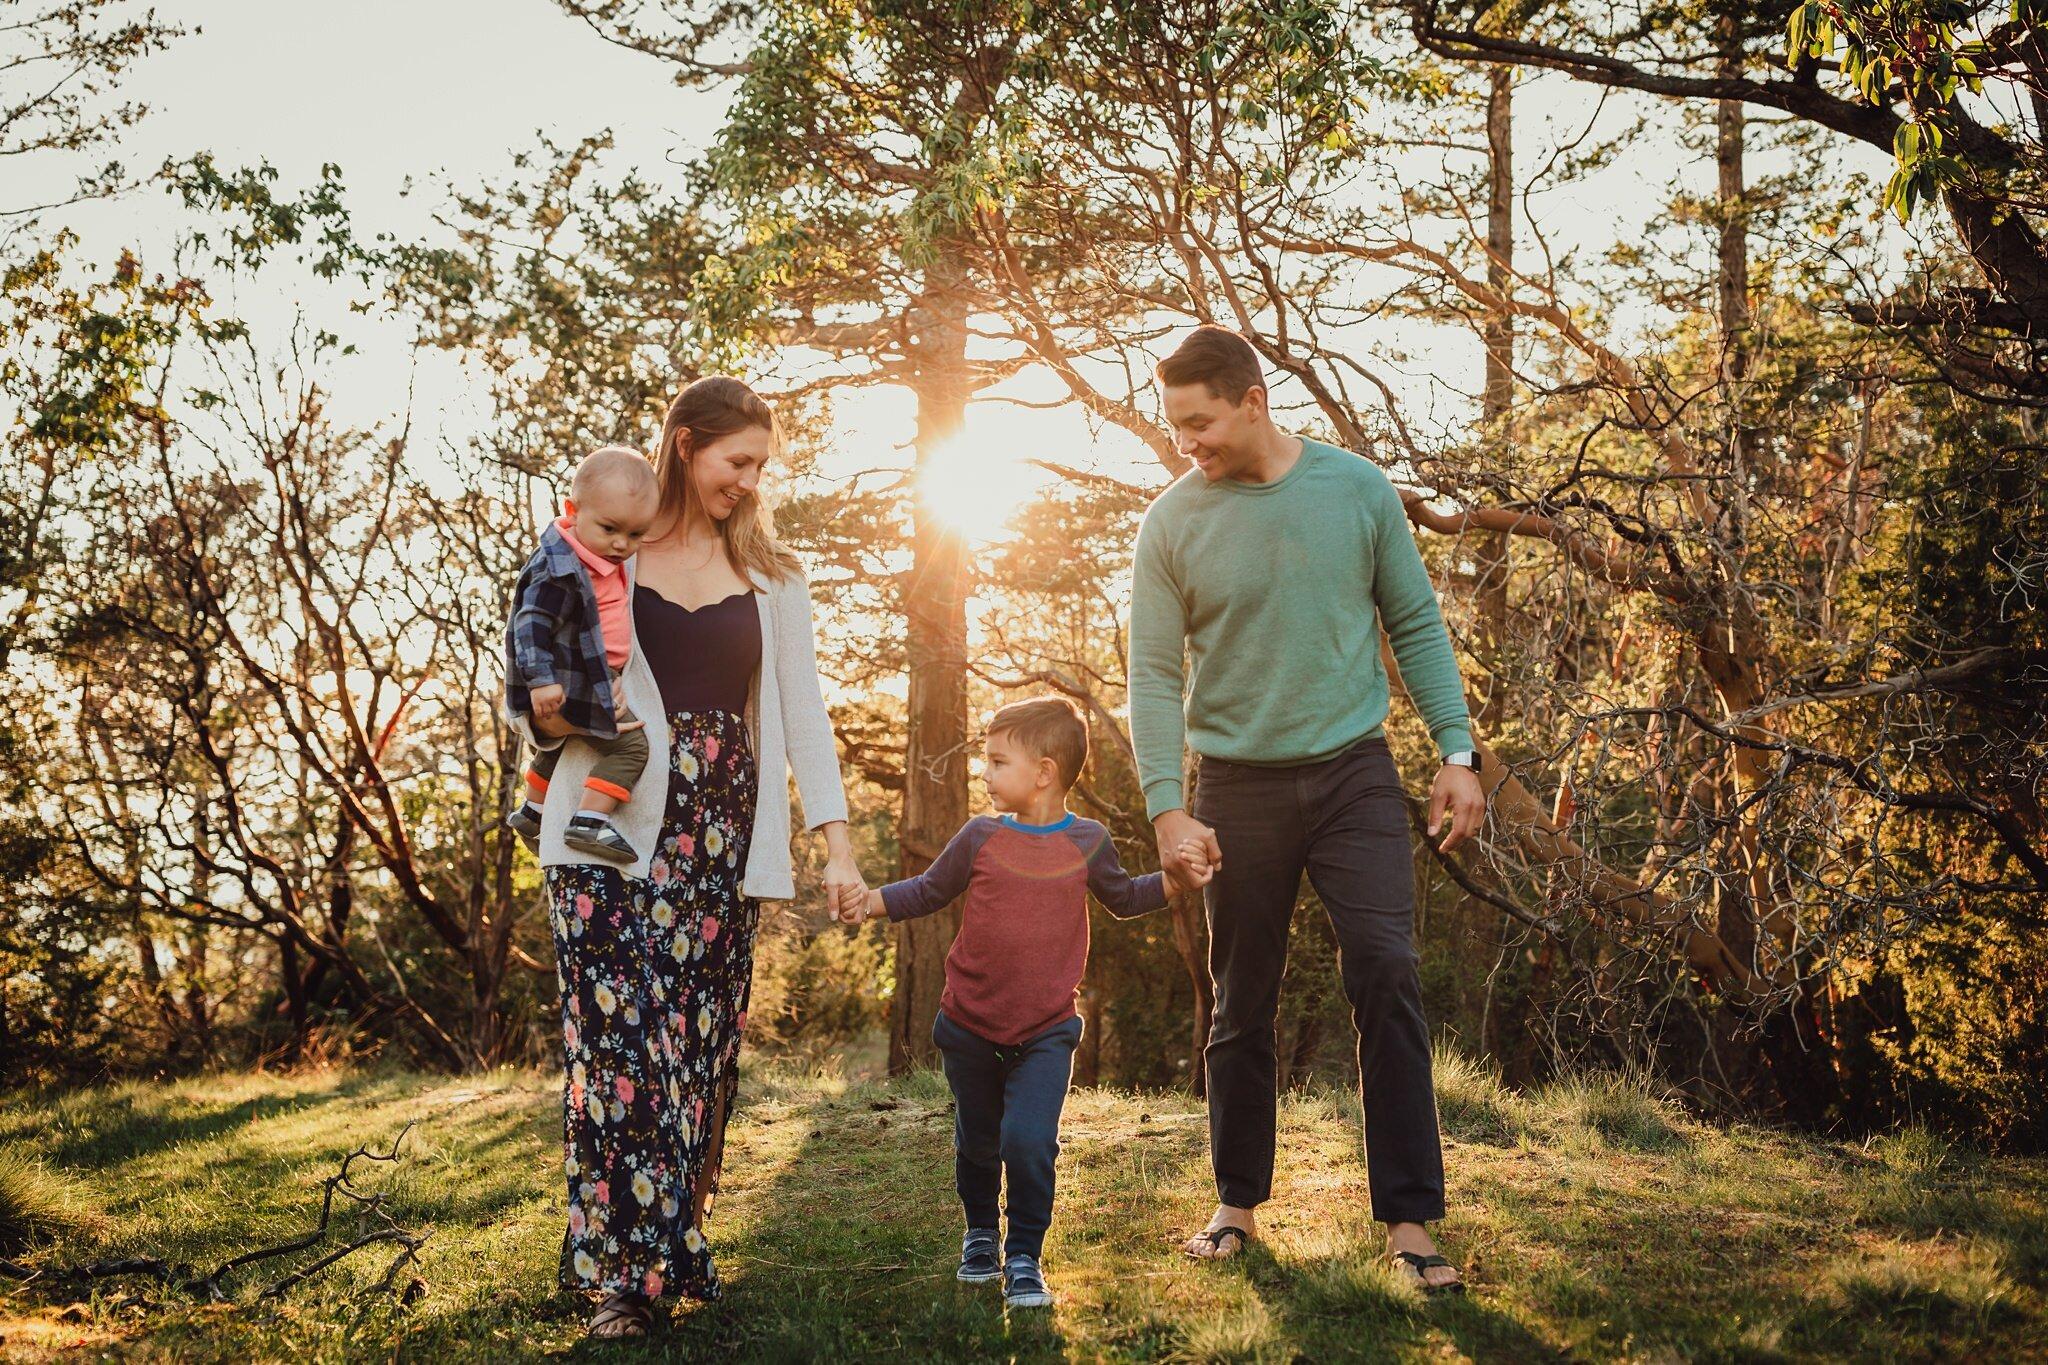 beautiful light as family walks through forest